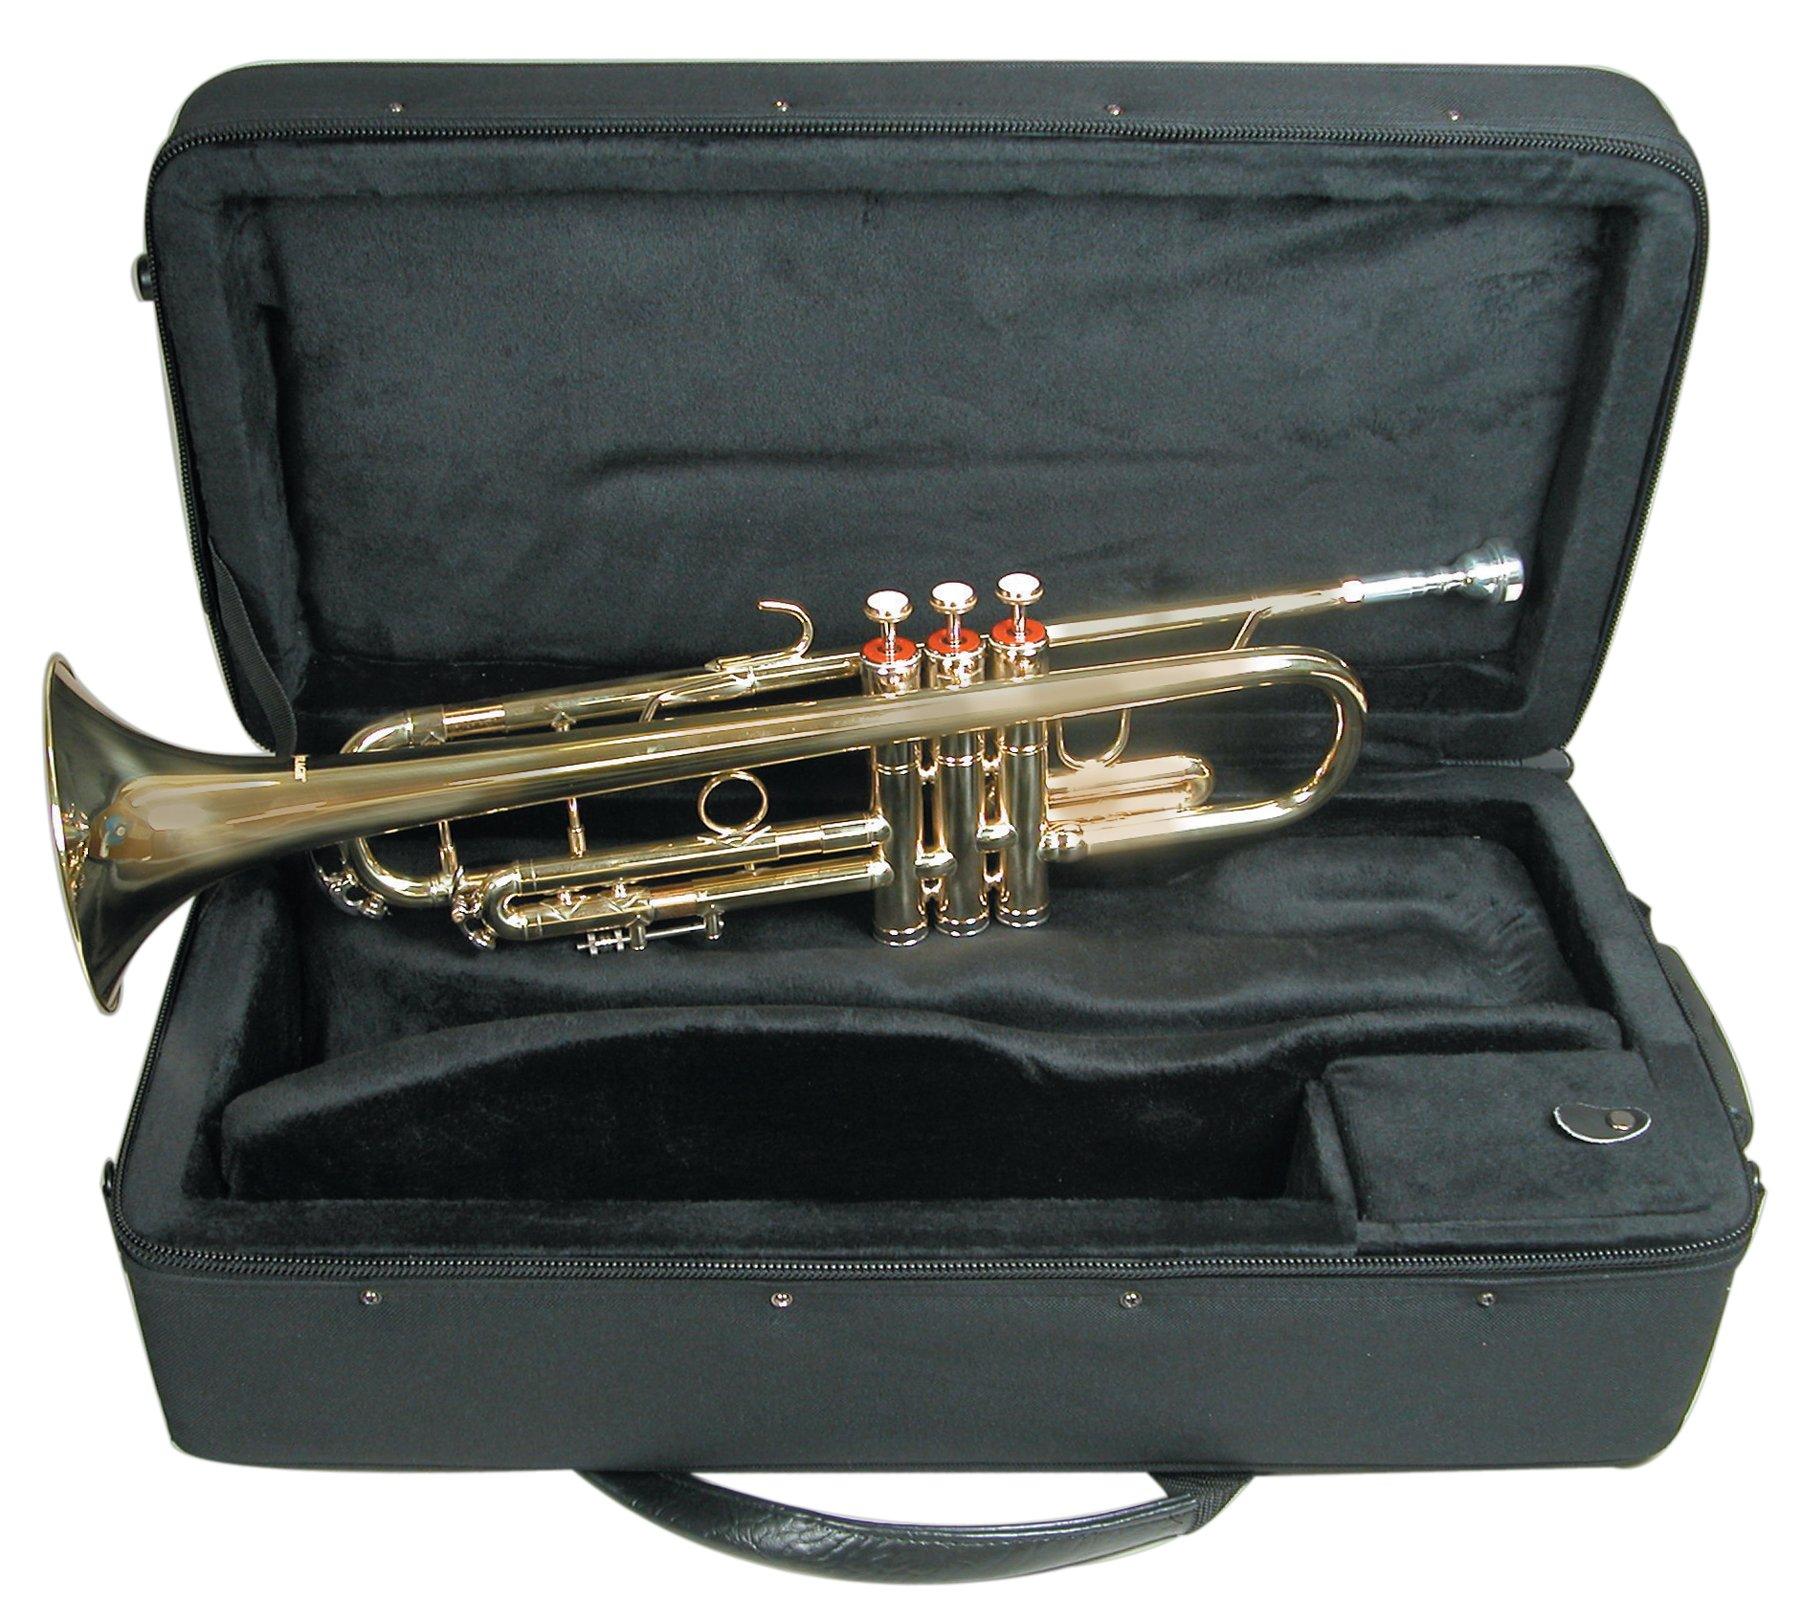 Mirage TT103 Deluxe Bb Trumpet with Case